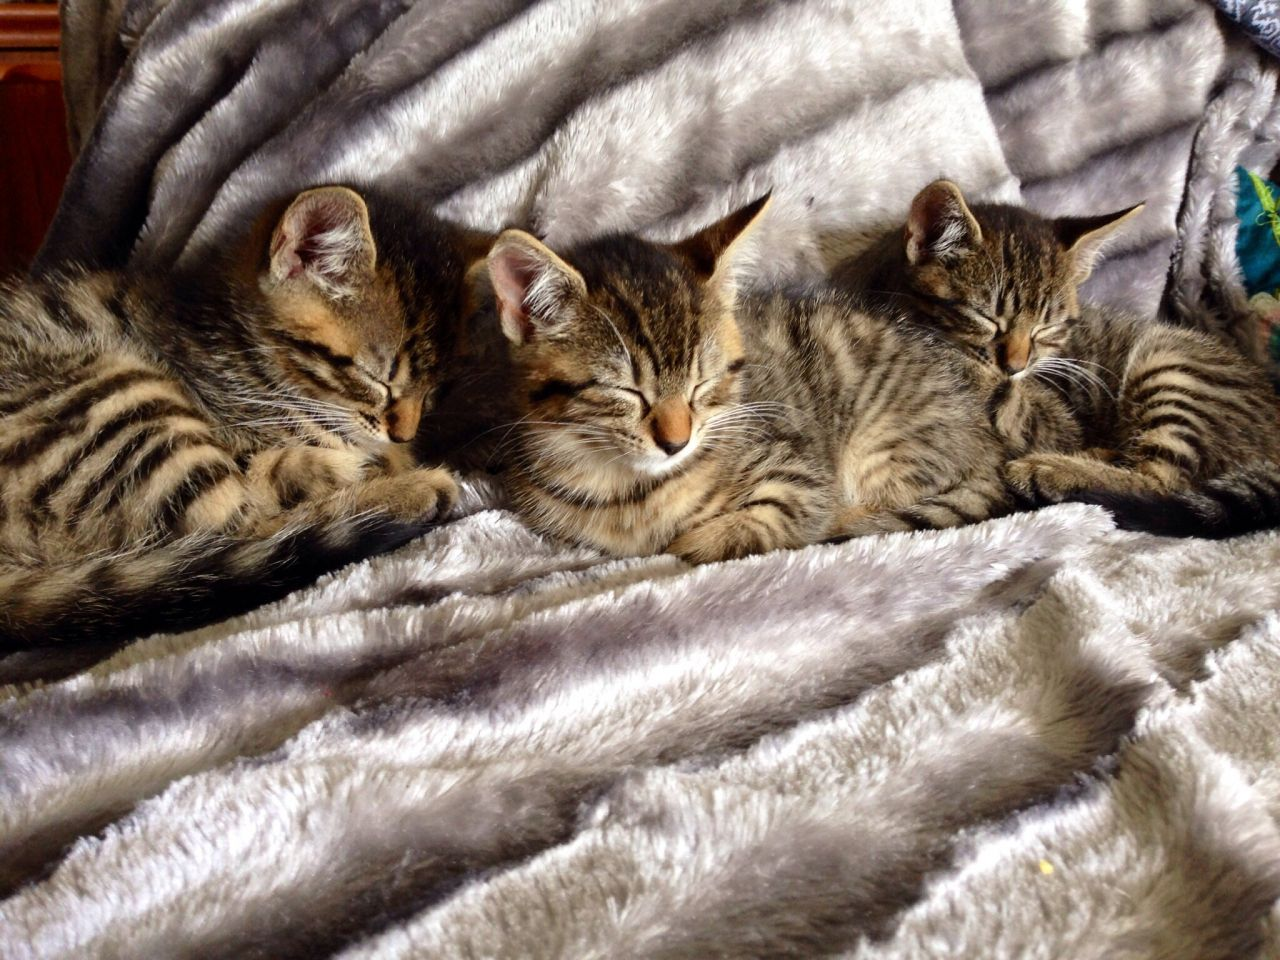 Toyger Cat: Toyger Httpccwwwpictures Of Catsorgcsctoyger Buck Jpg Breed